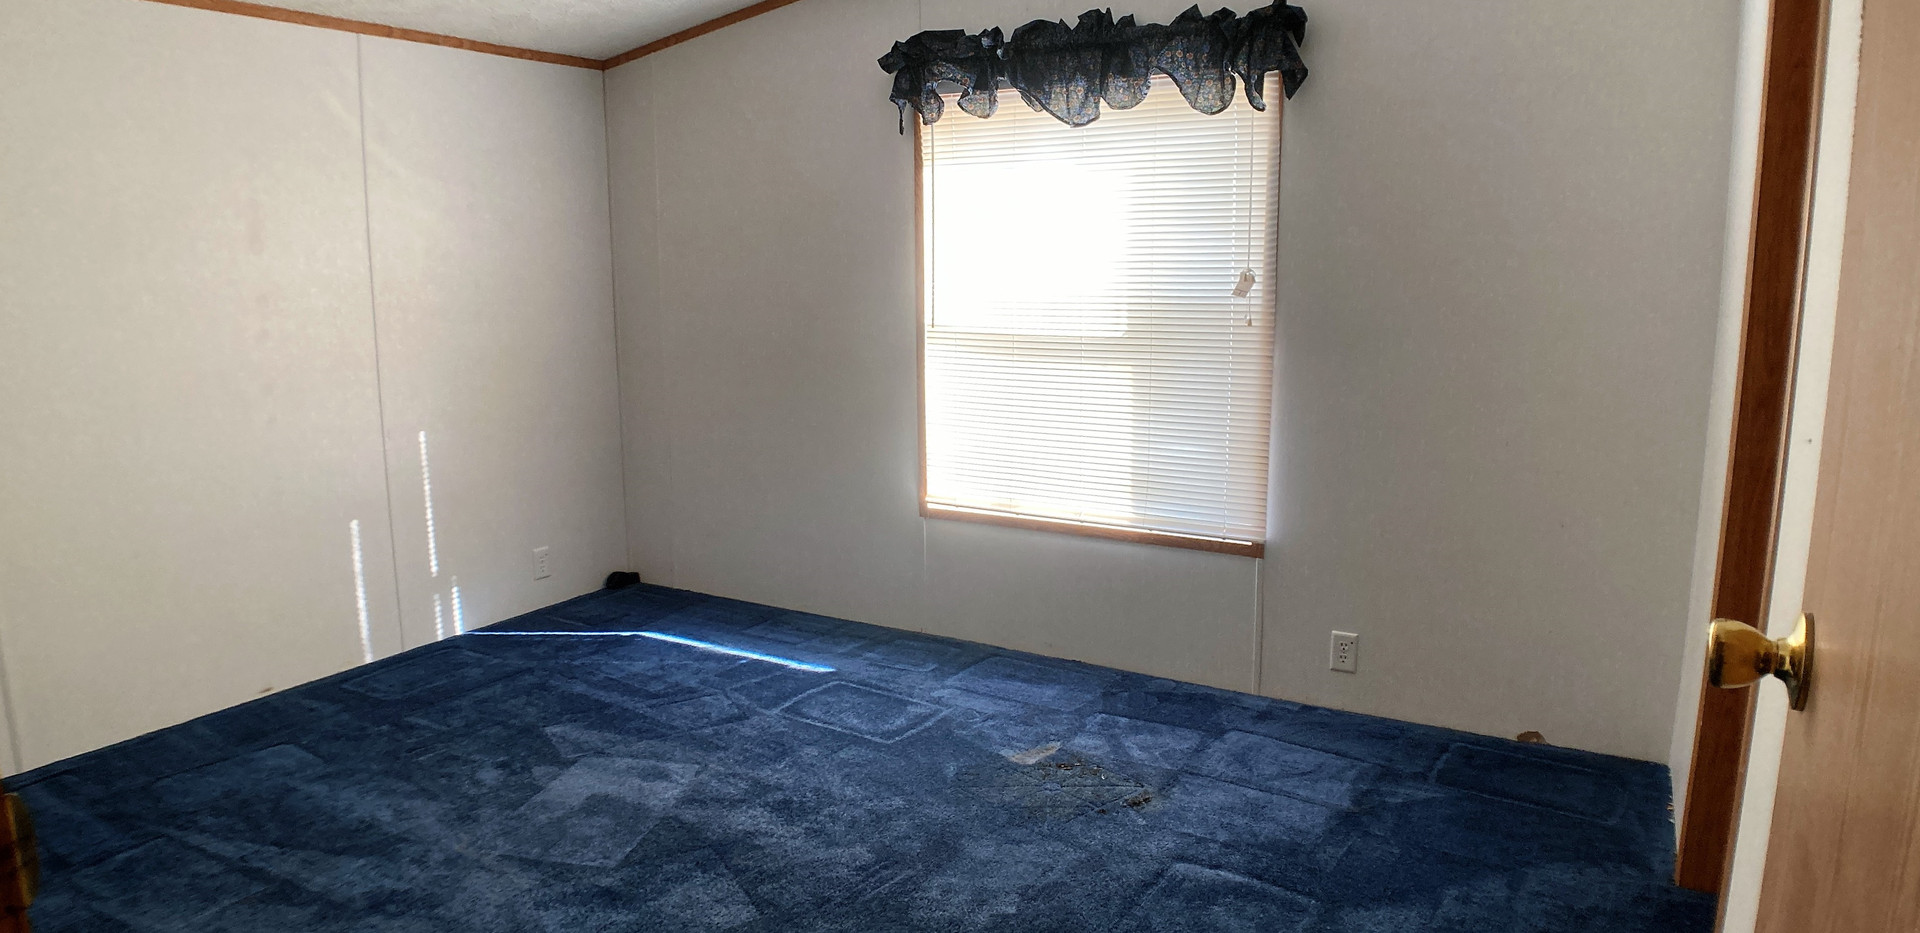 w13-310-Bedroom1.jpg